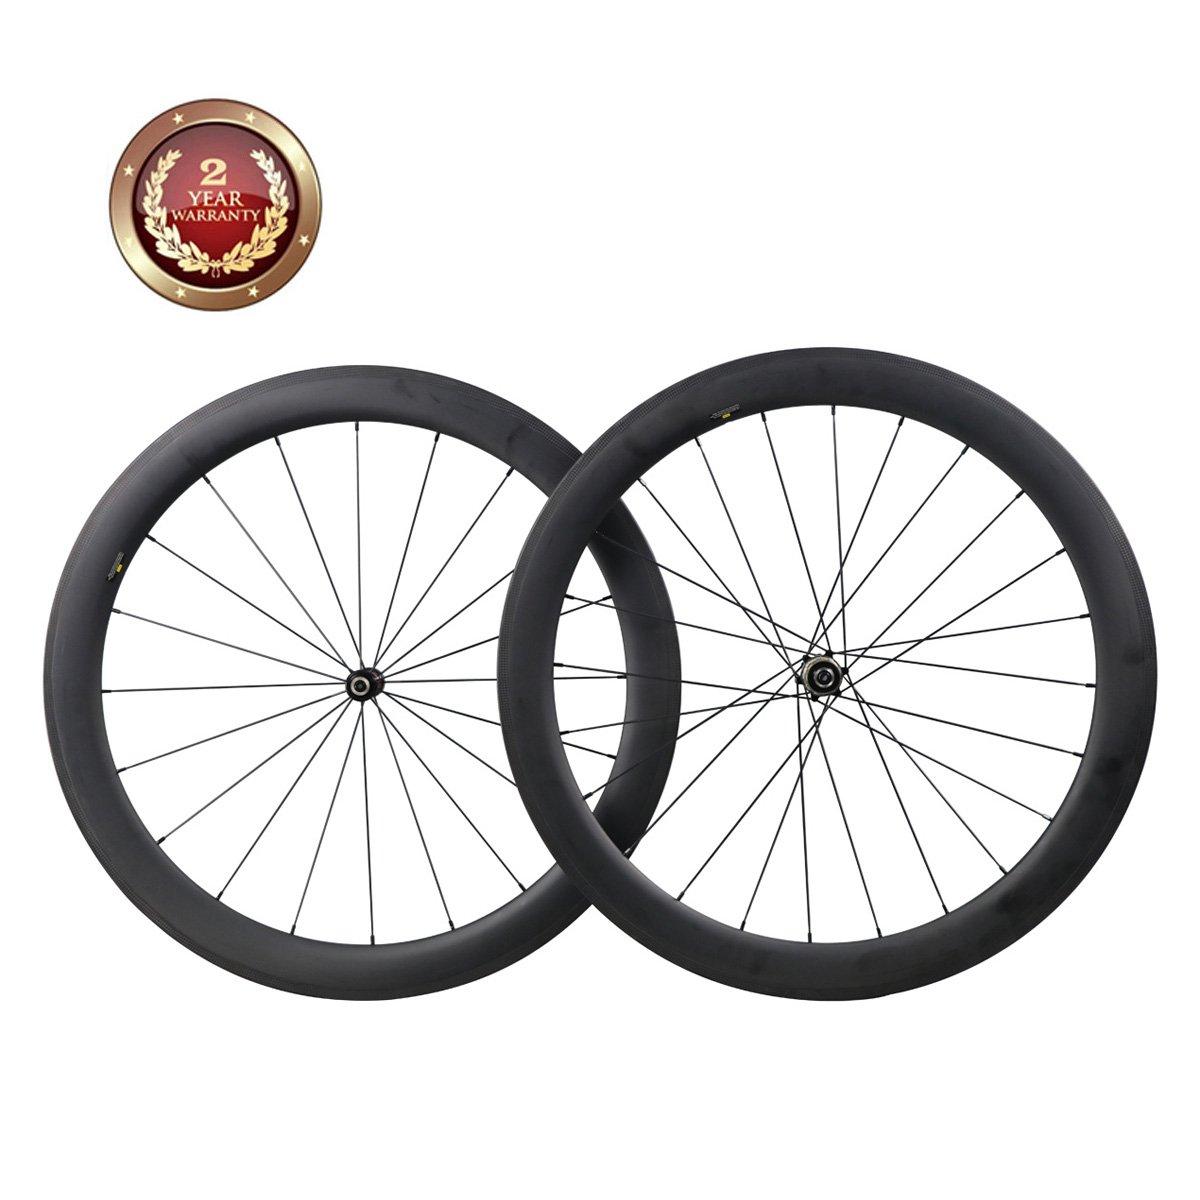 Flashfox 700C 30mm Road Bicycle Rims 25mm Width Tubular carbon fiber road wheels